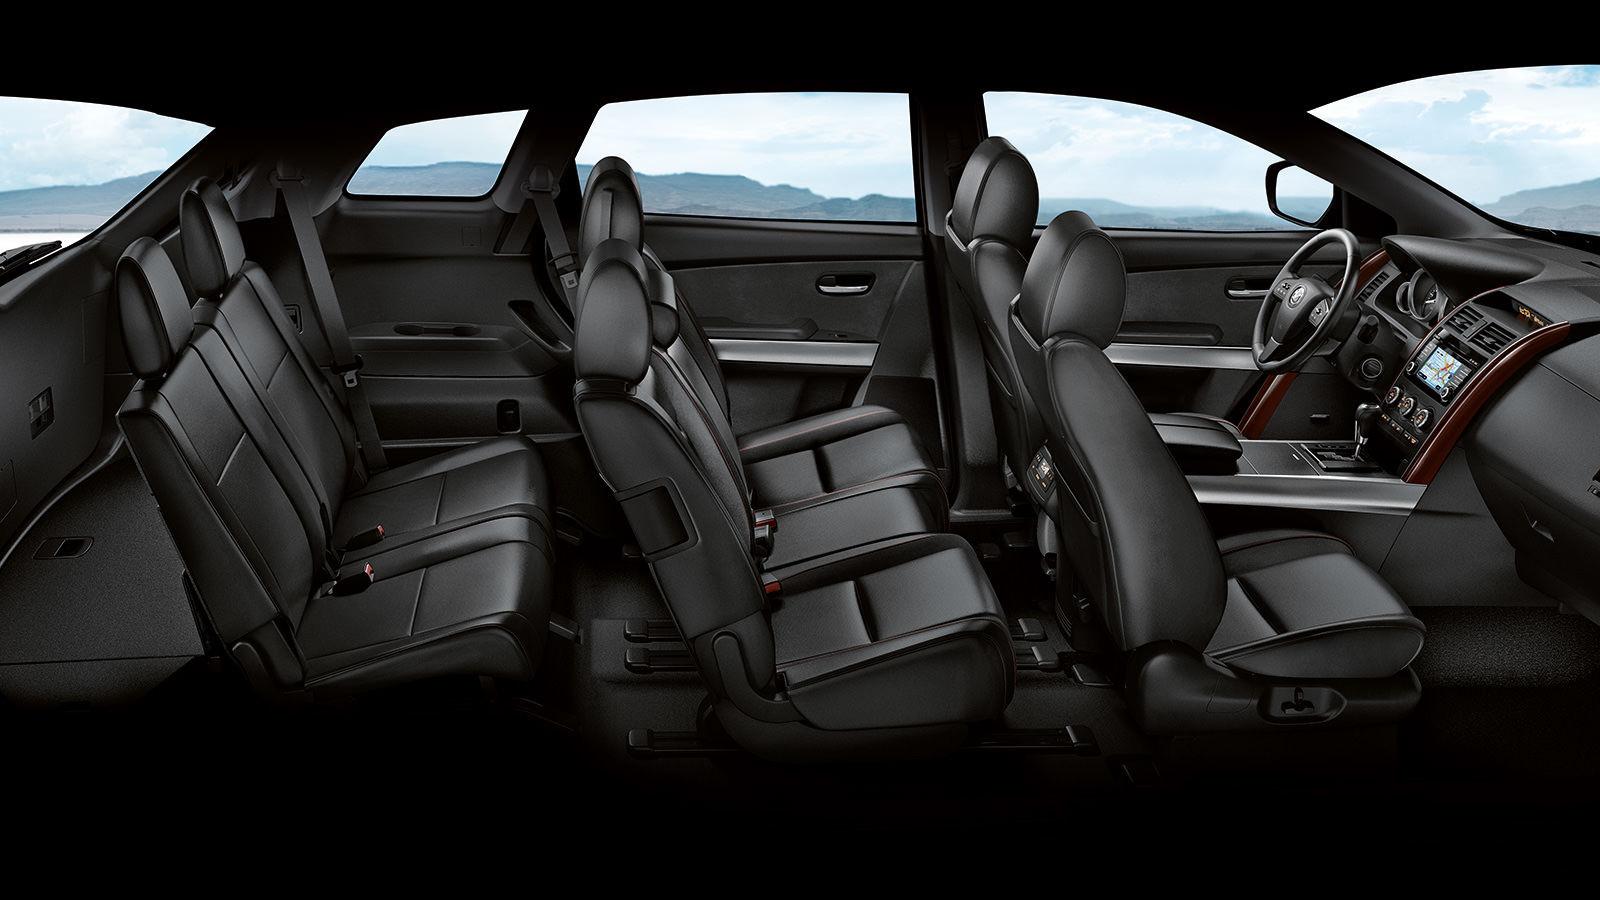 Kramer Mazda | 2015 Mazda CX-9 – Comfortable, spacious, and fun to drive Picture 3